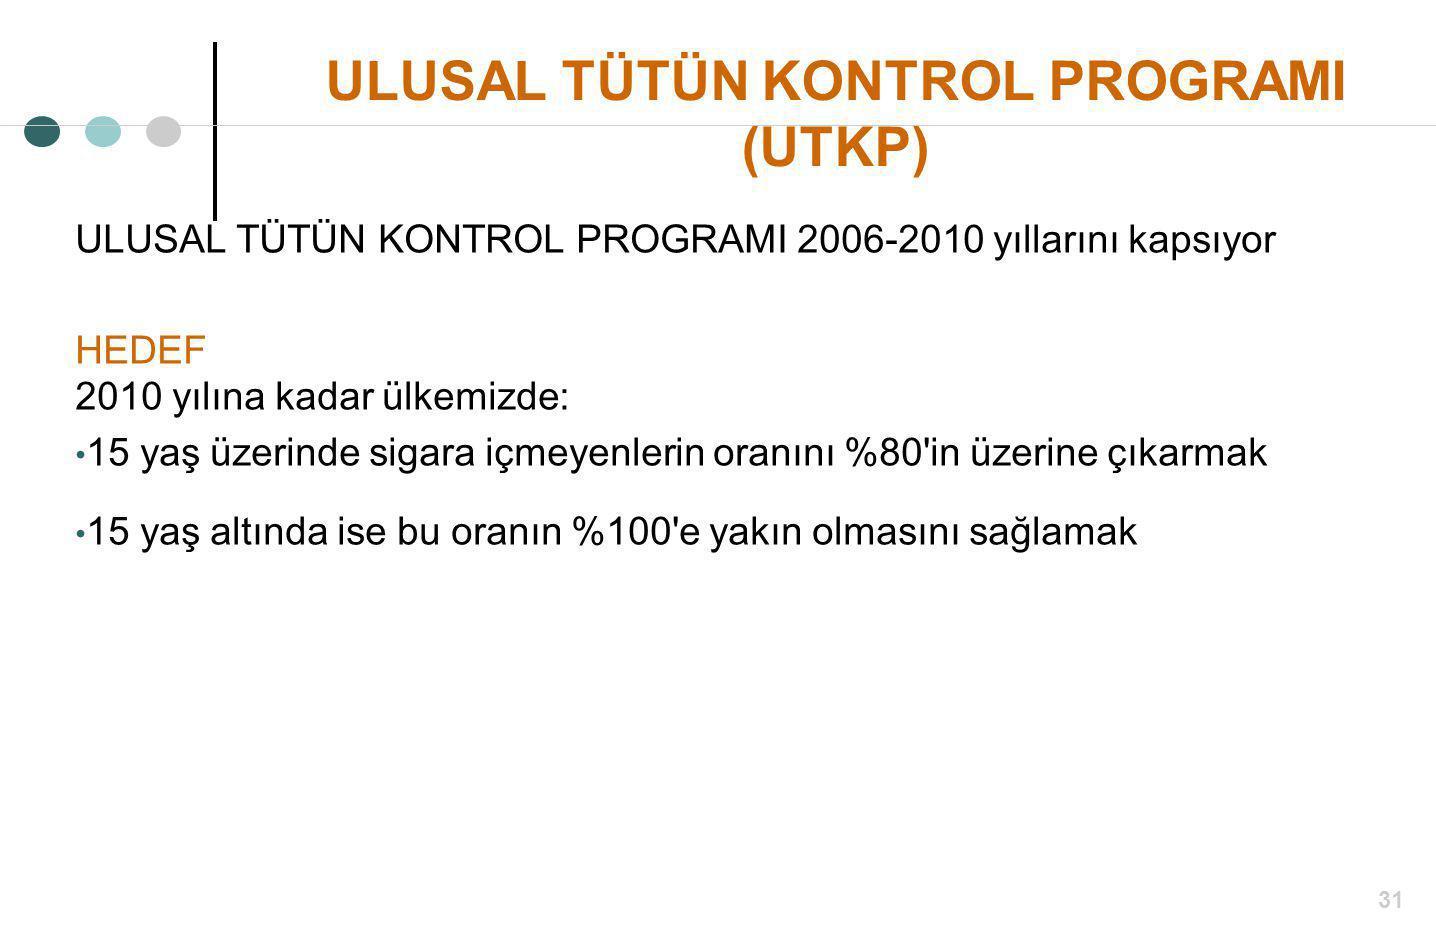 ULUSAL TÜTÜN KONTROL PROGRAMI (UTKP)